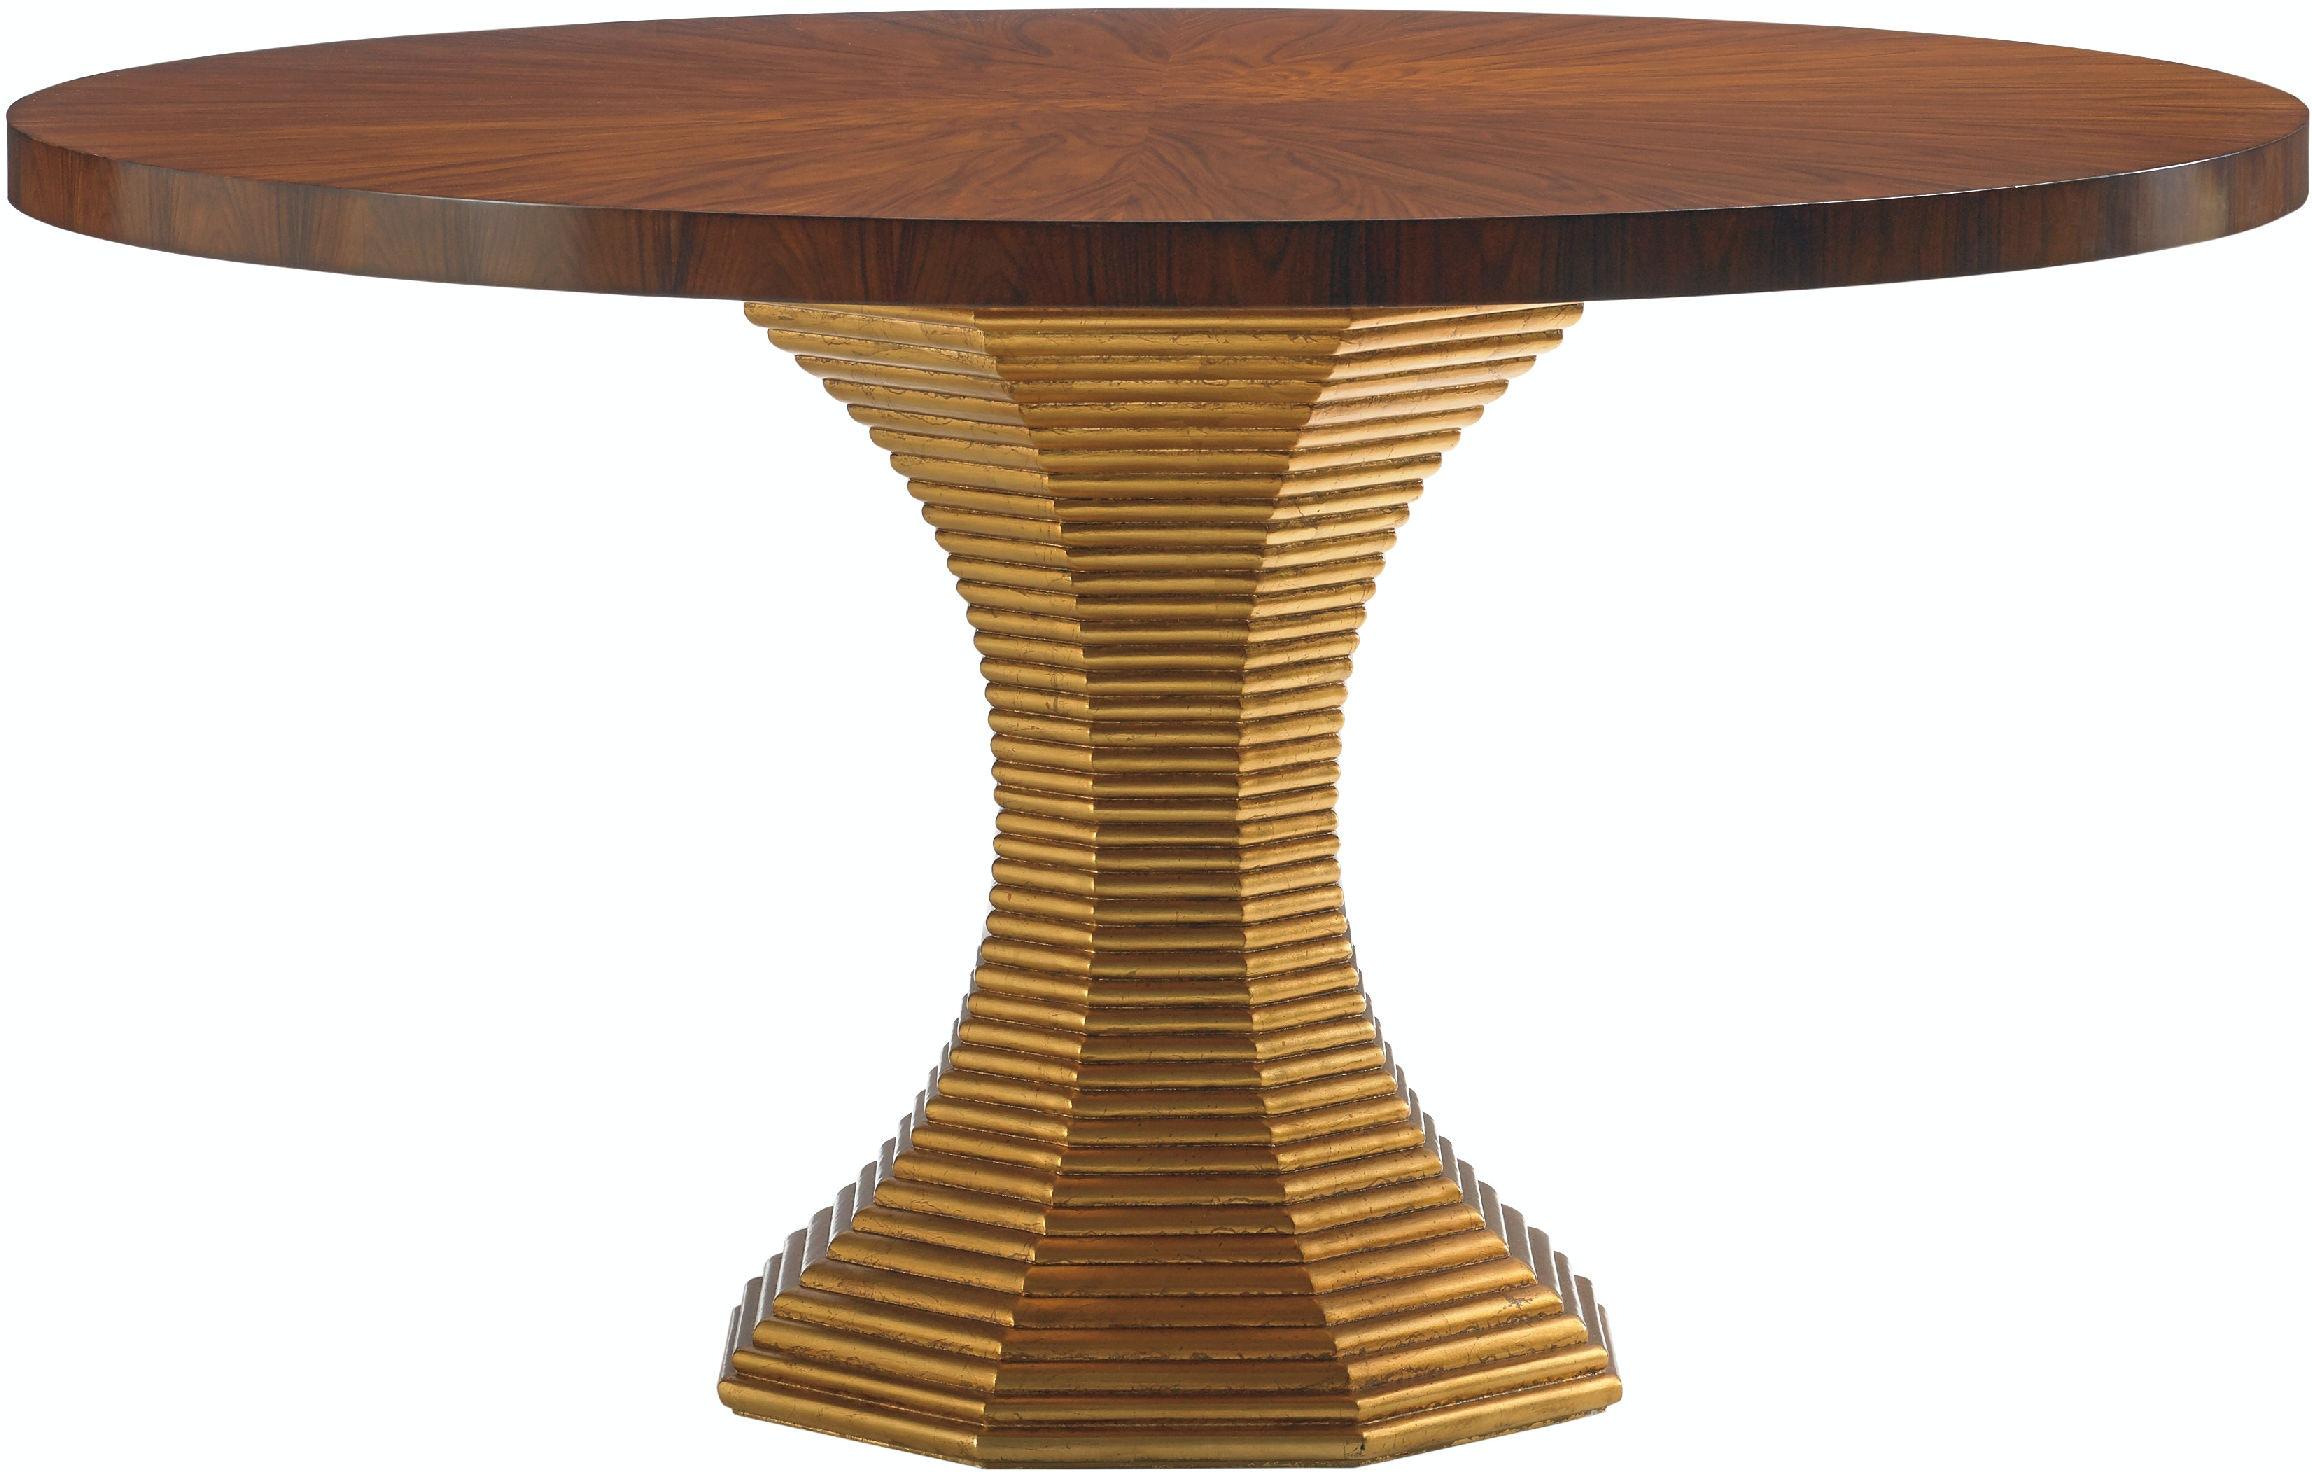 Lexington Dining Room Regency Round Dining Table Base 723 875B